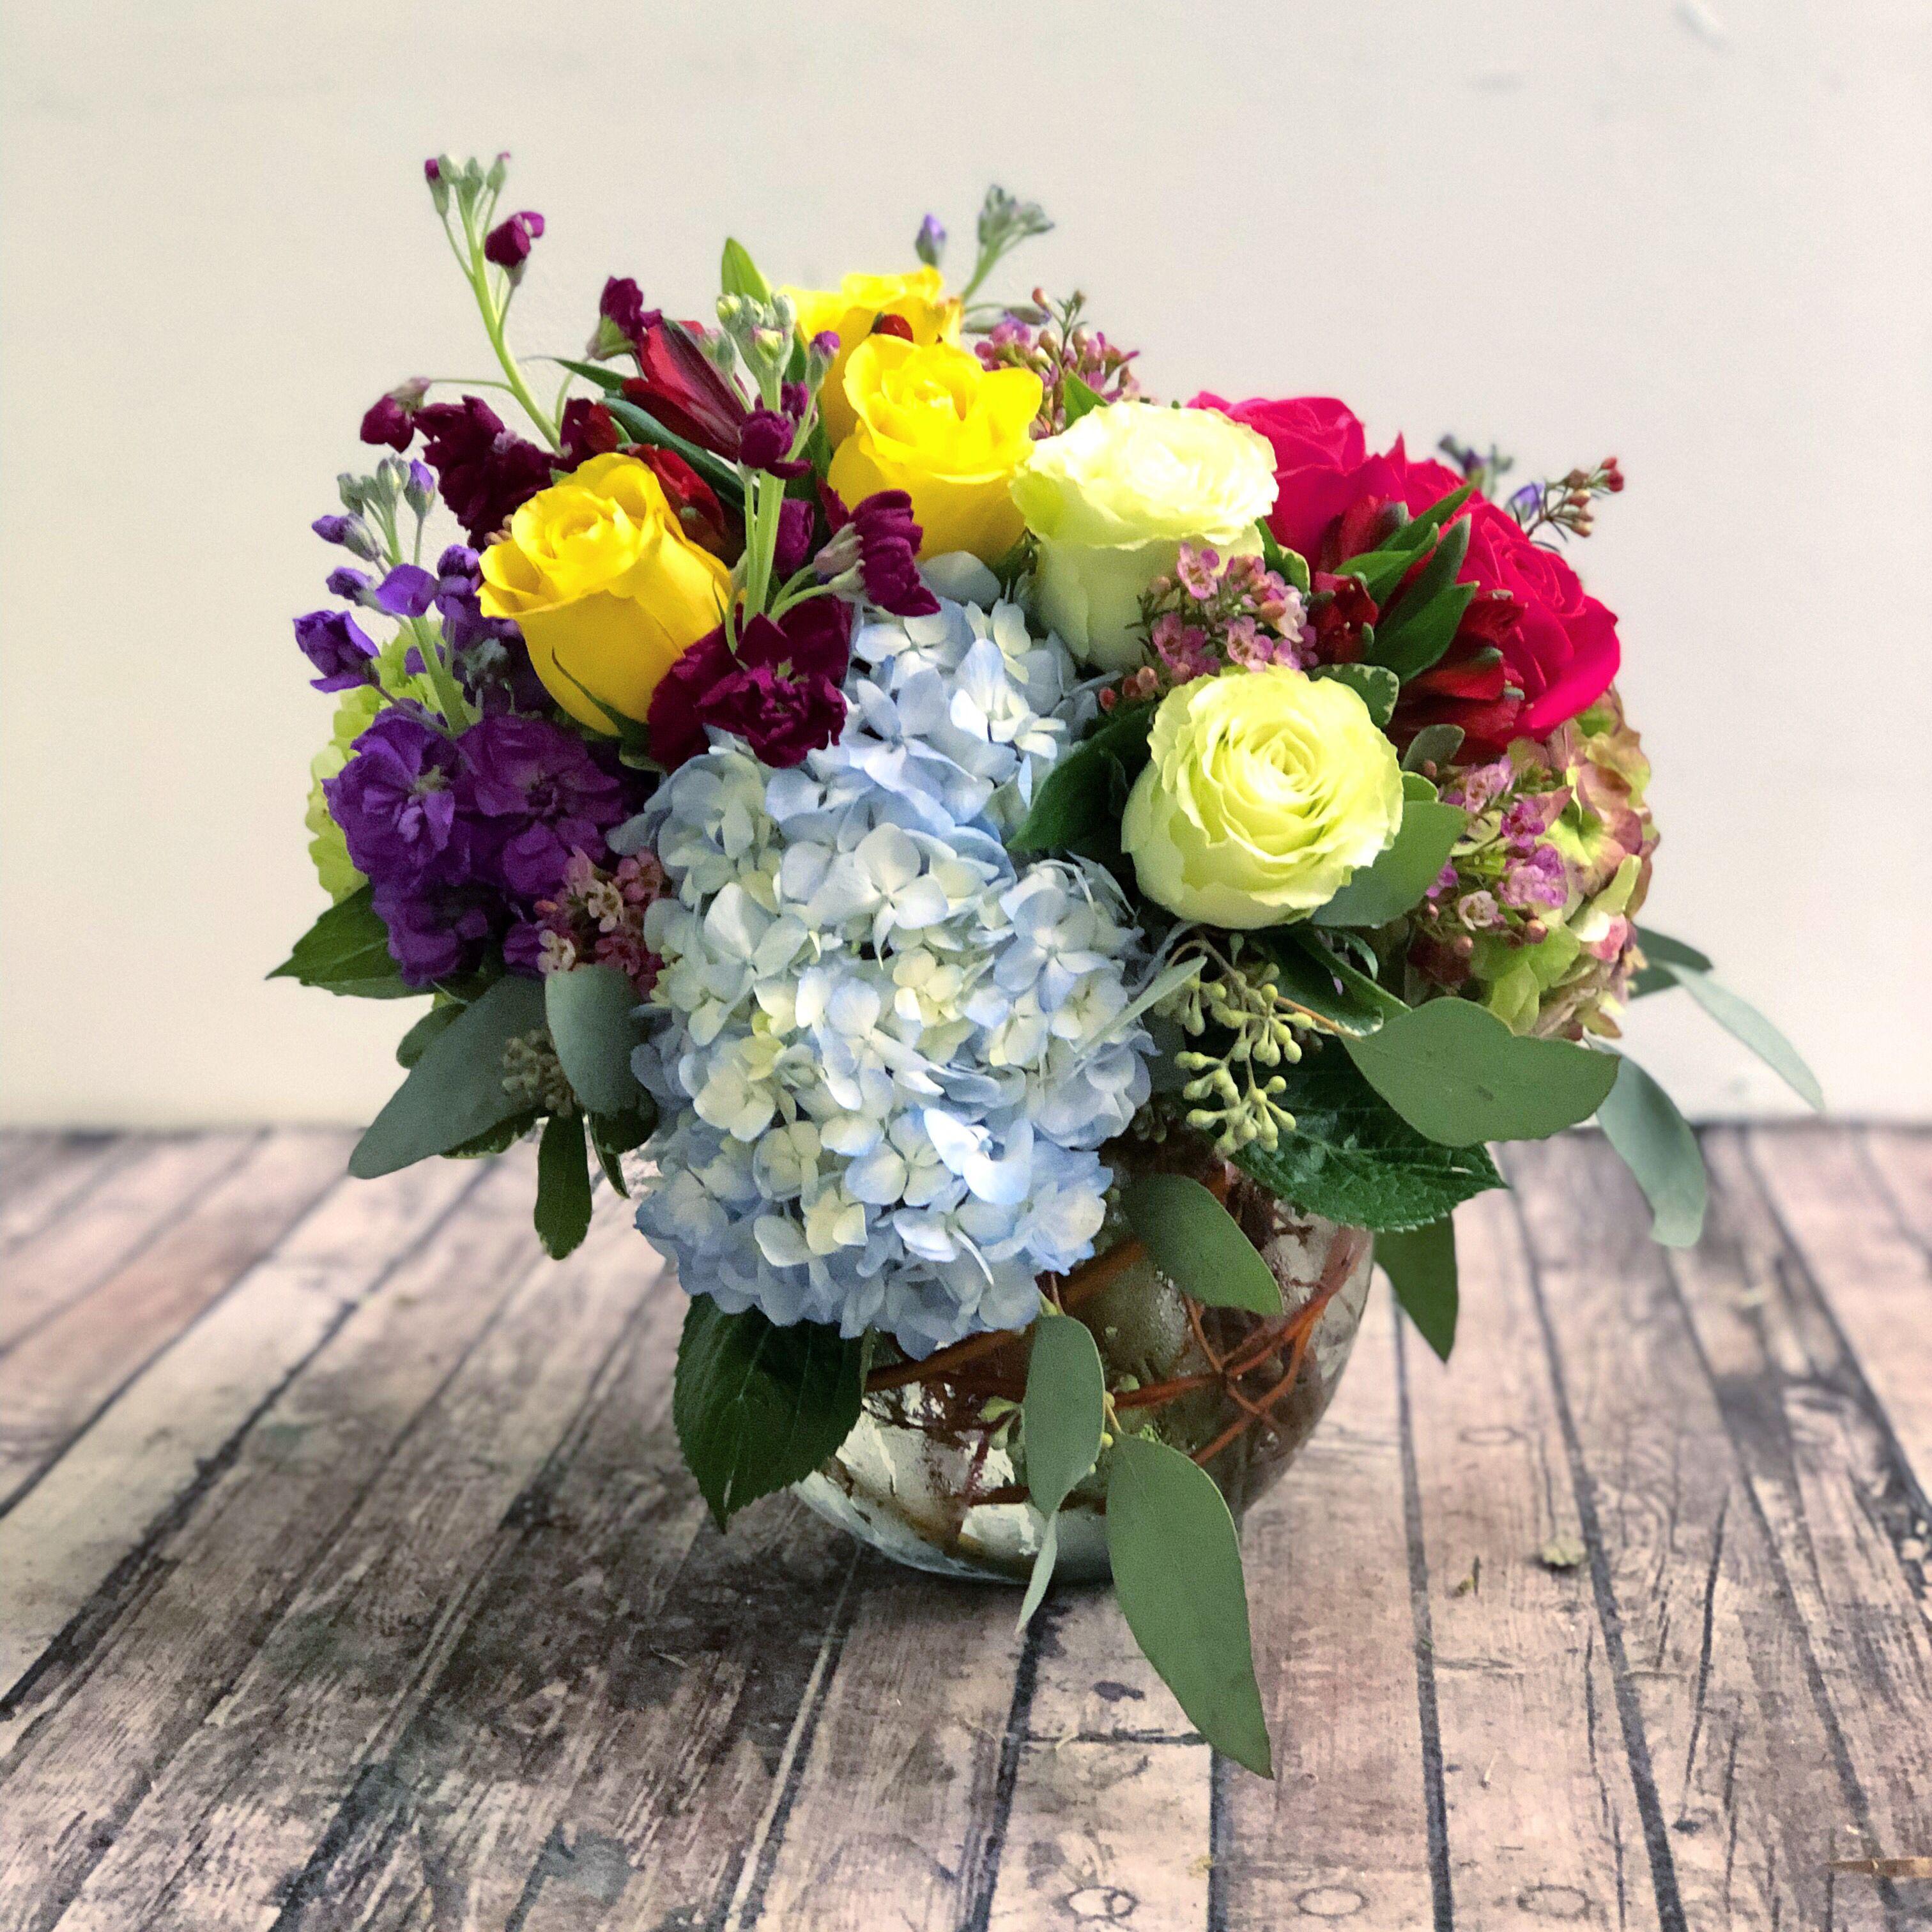 Bubble Of Flowers Flower Arrangements Flower Delivery Flowers